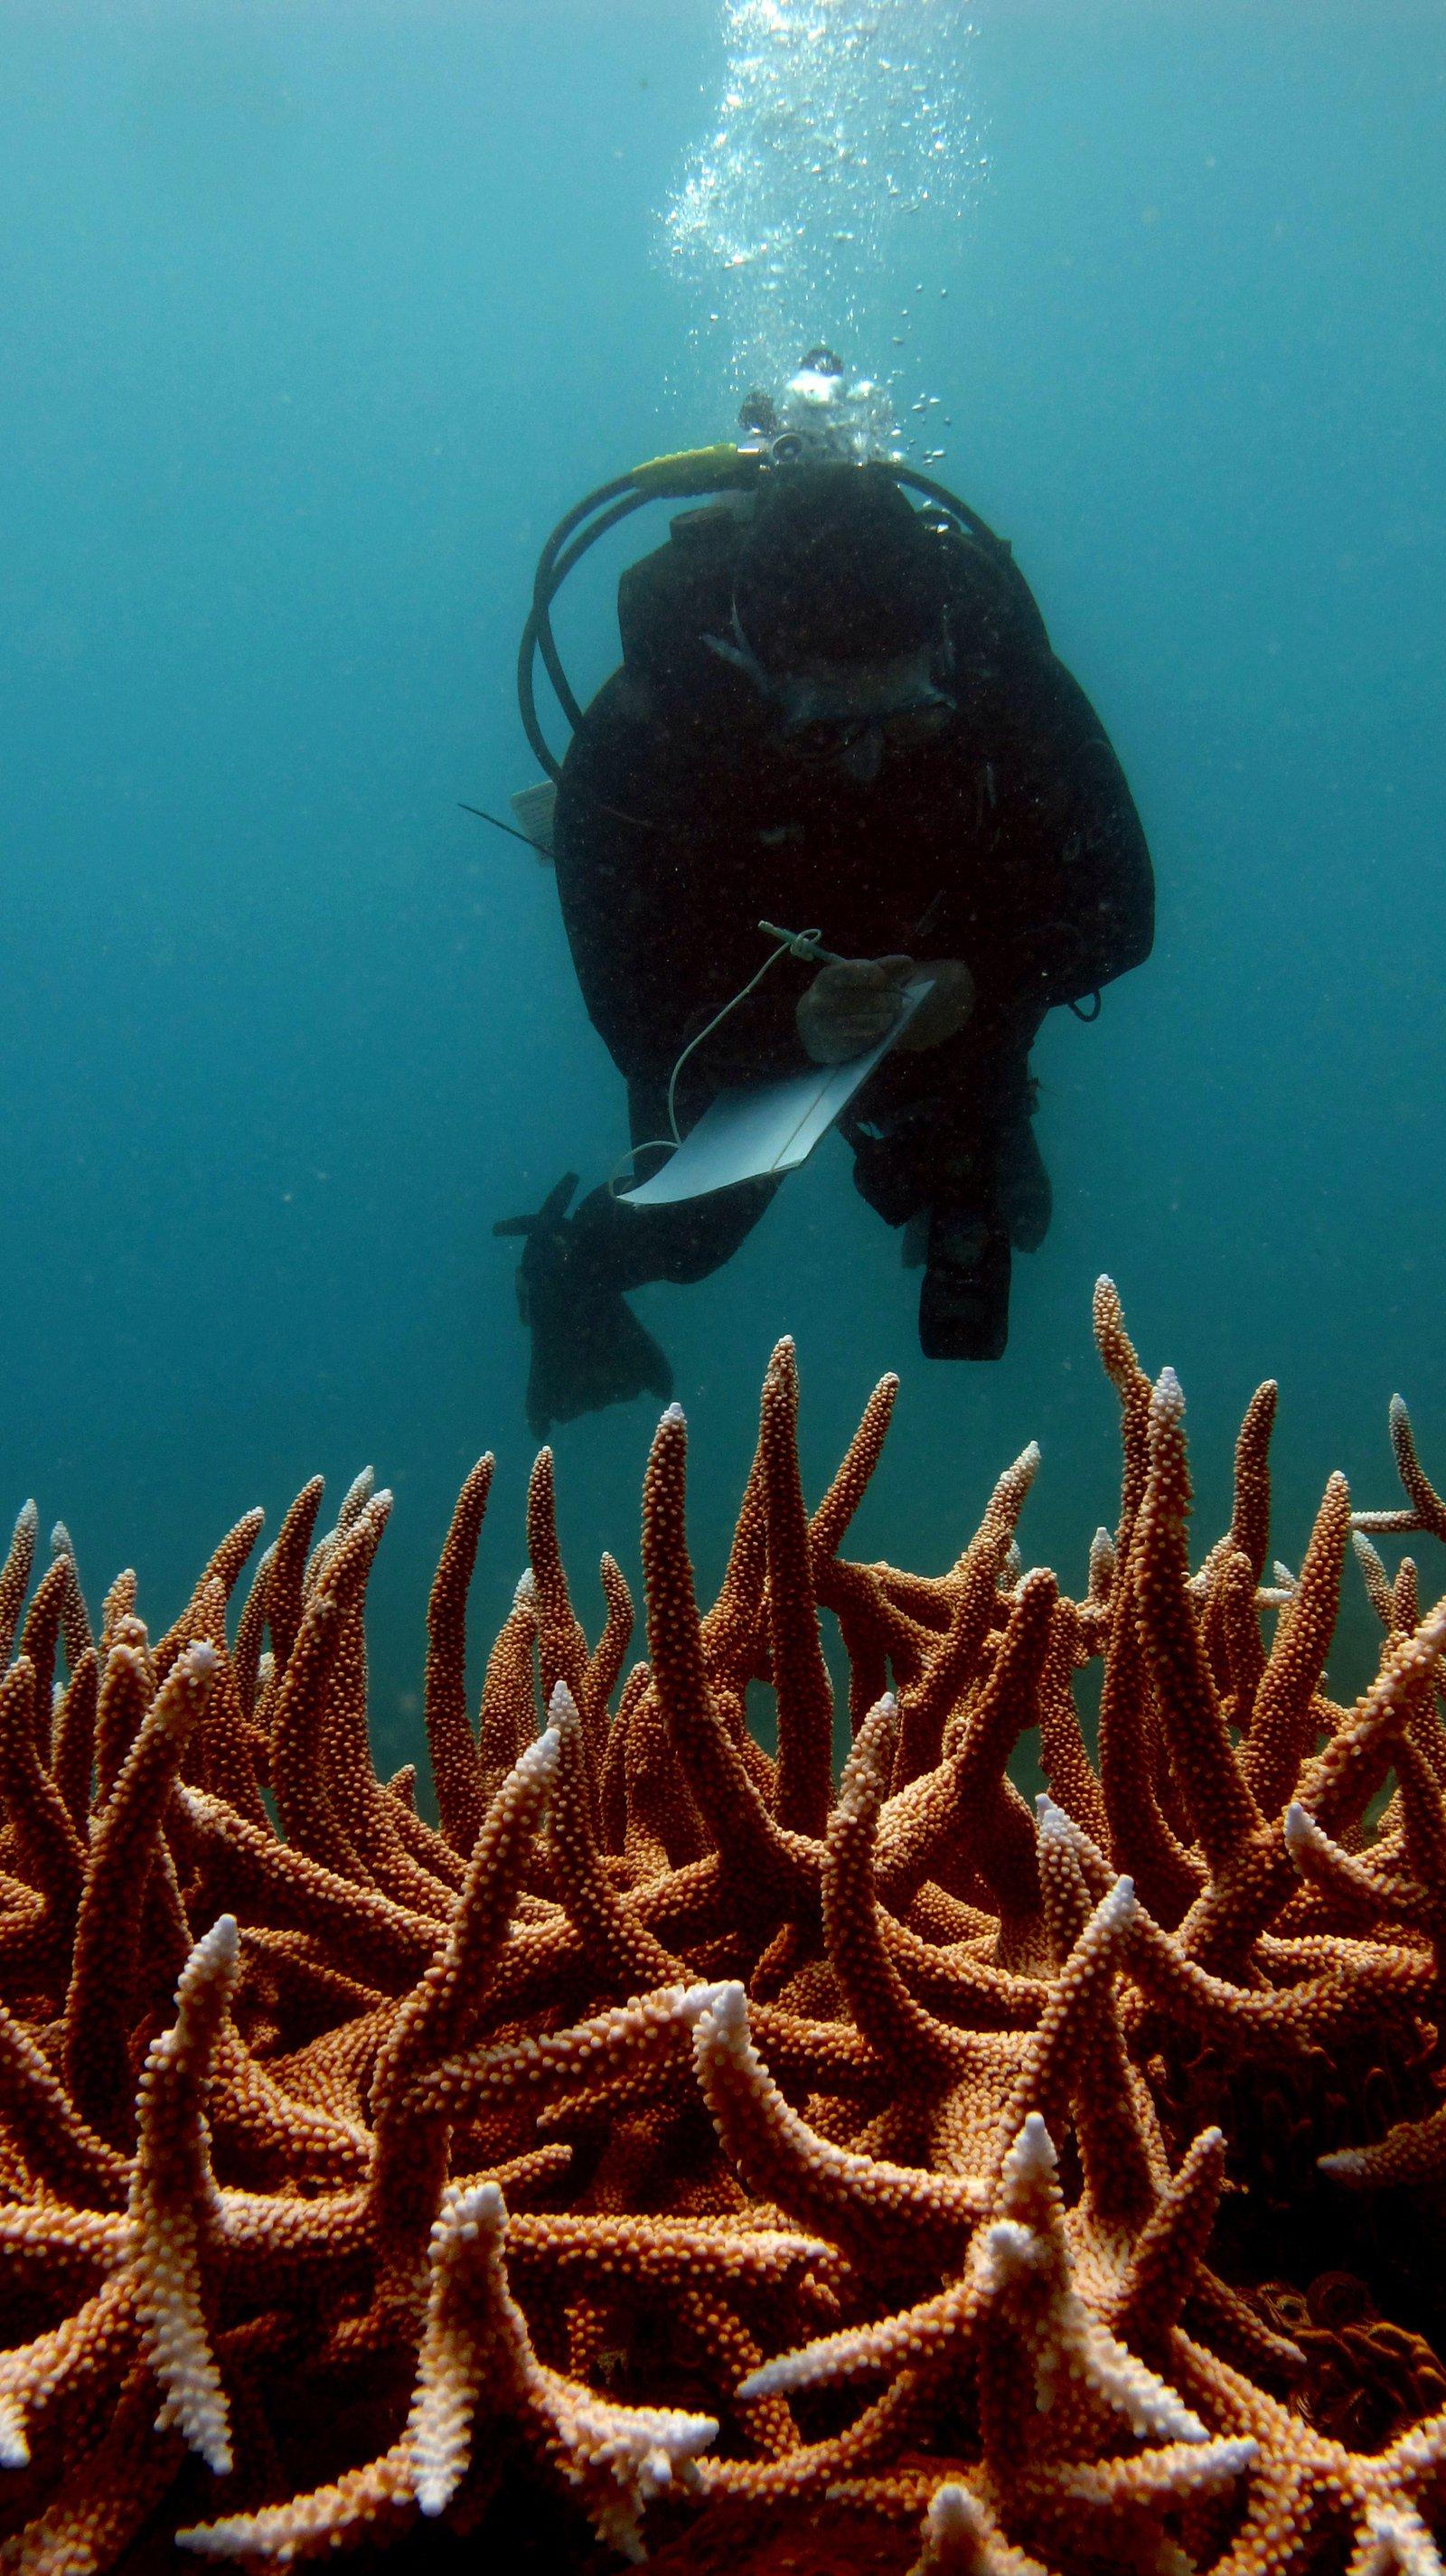 Zoe surveying coral biodiversity